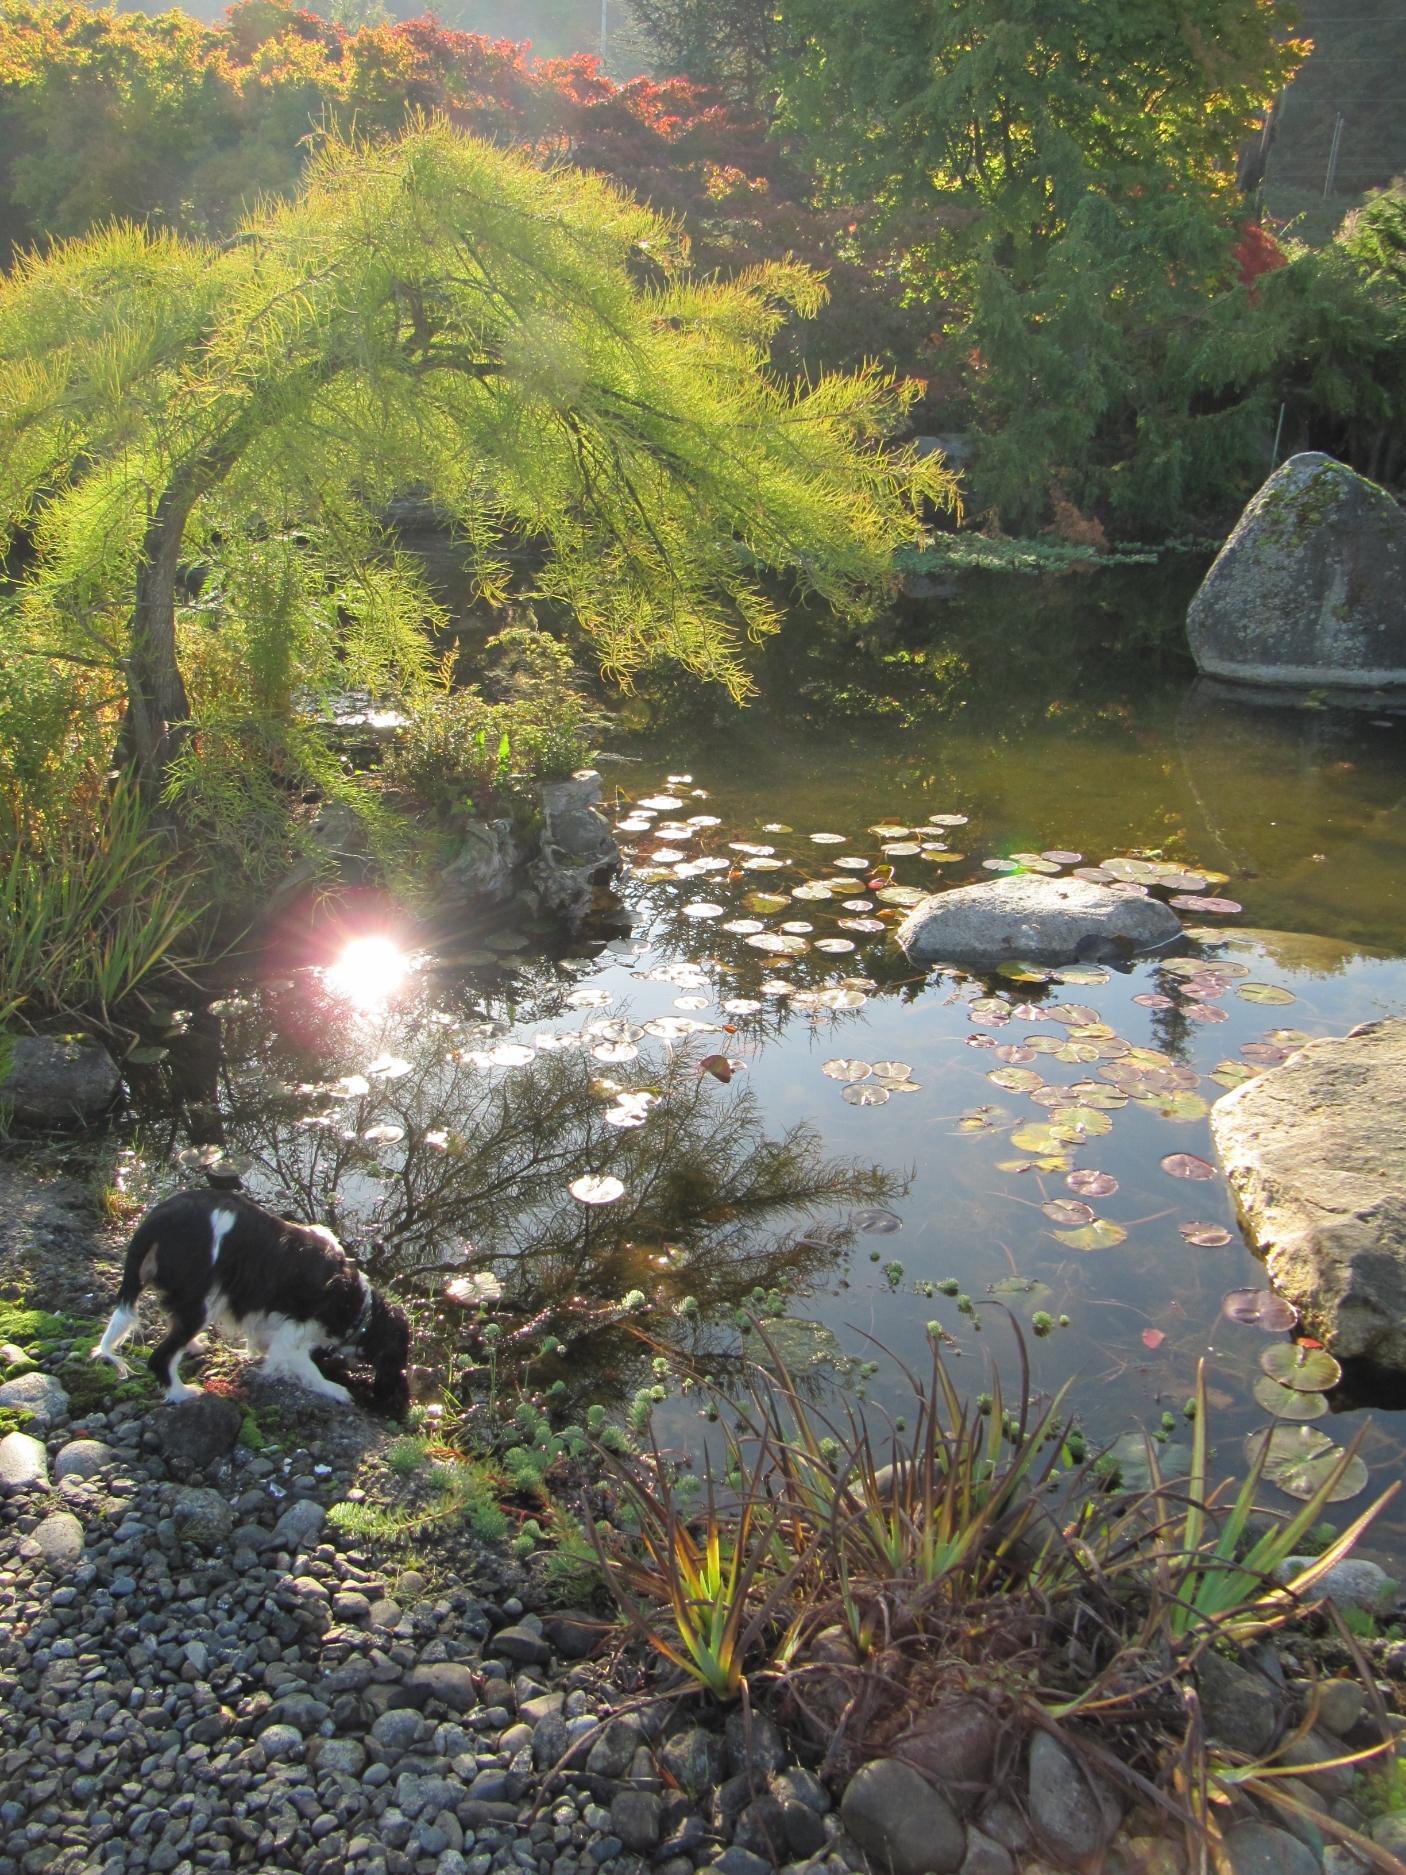 sunlight_on_pond_puppy.jpg